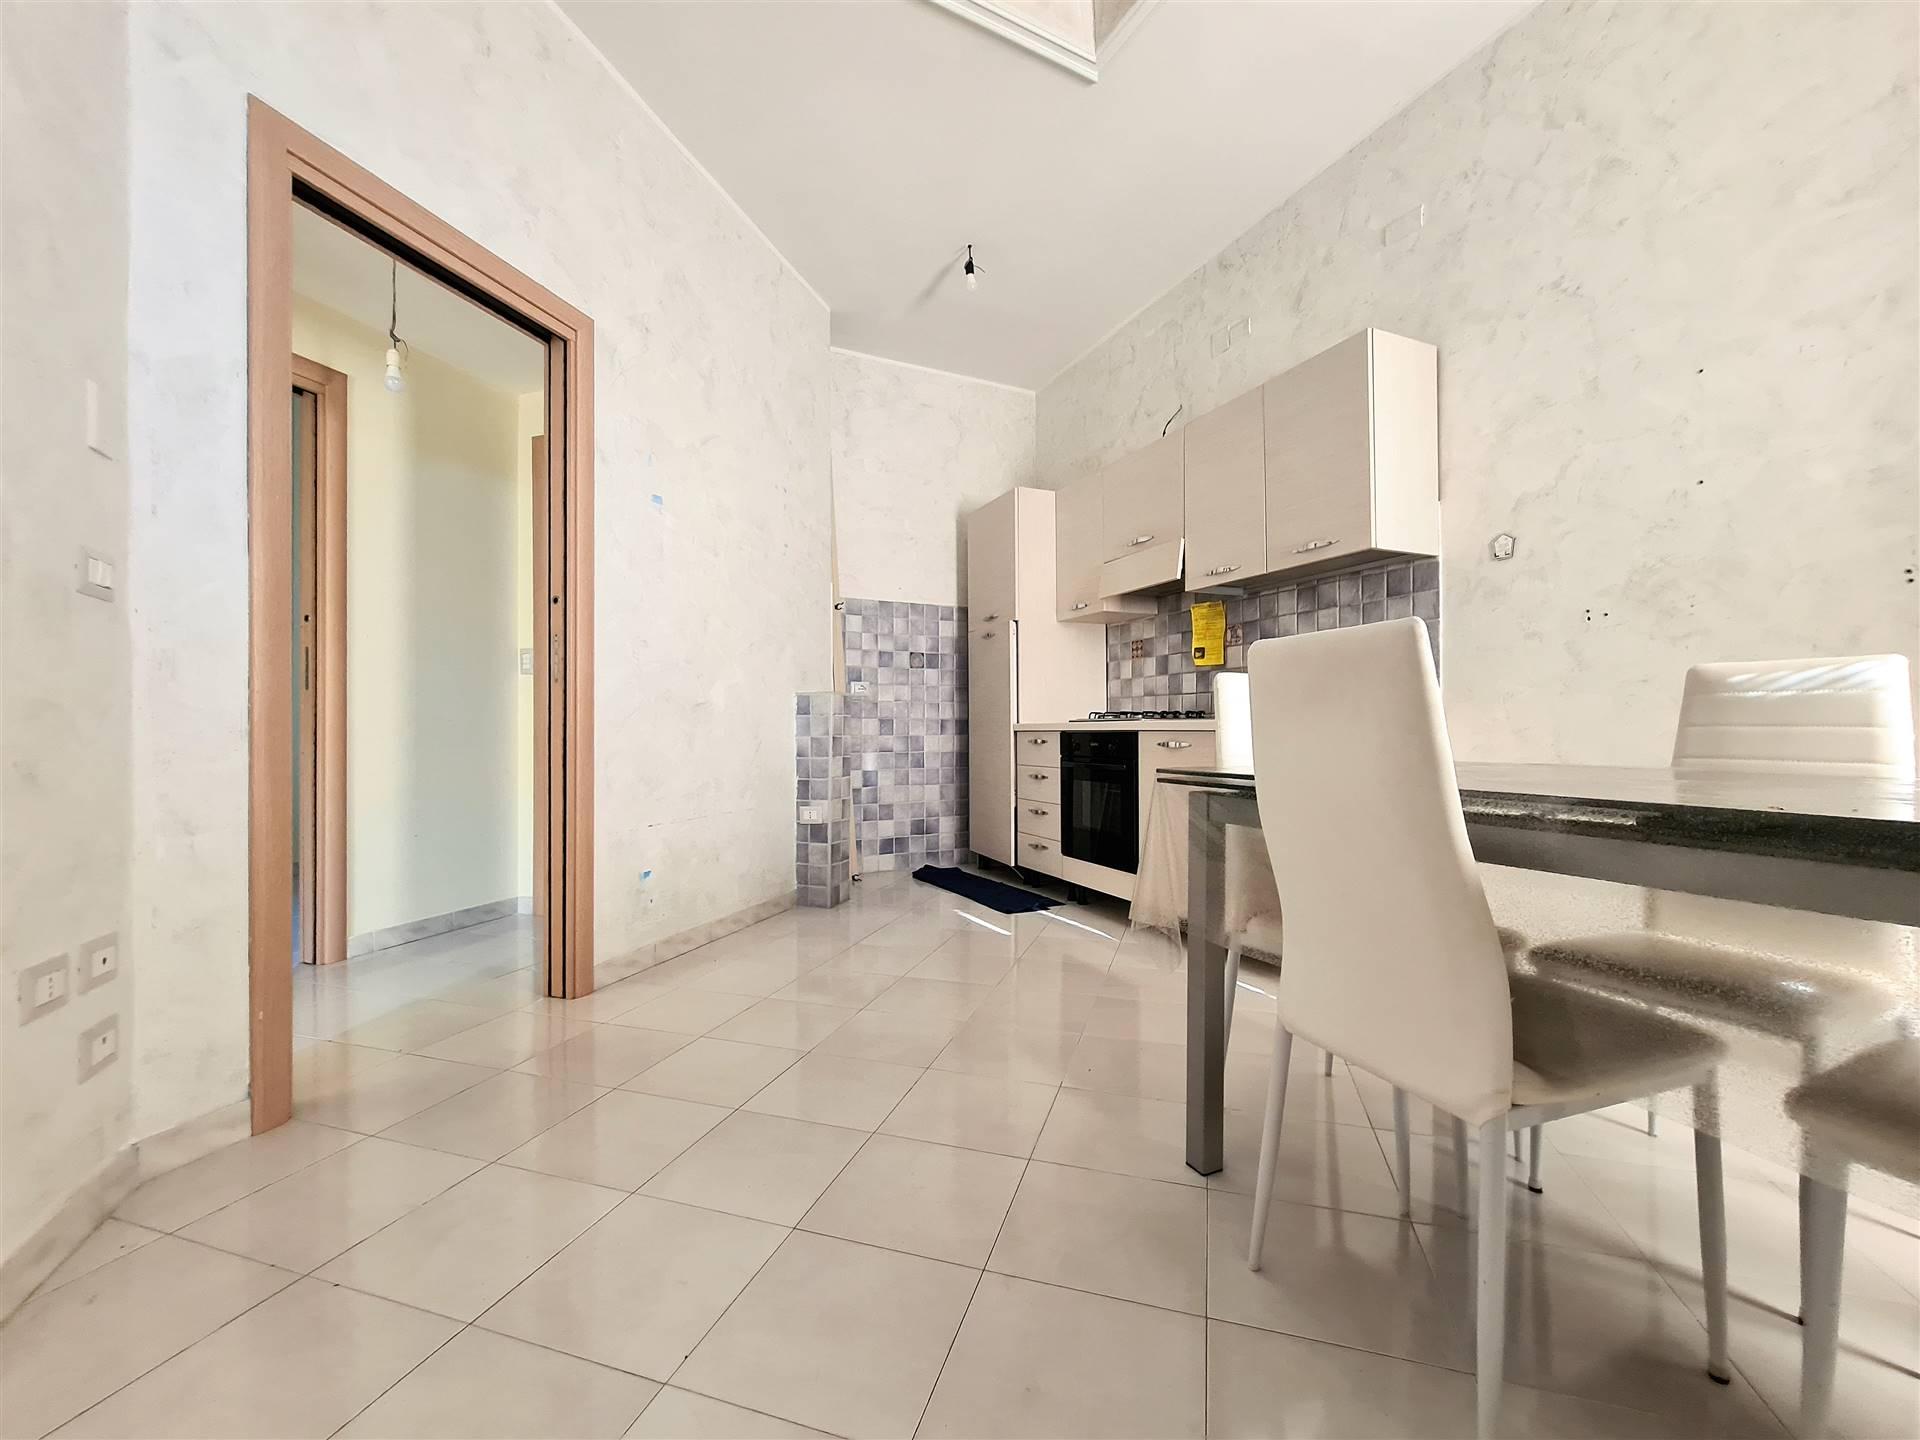 AF753C-Appartamento-SANTA-MARIA-CAPUA-VETERE-Via-degli-Orti